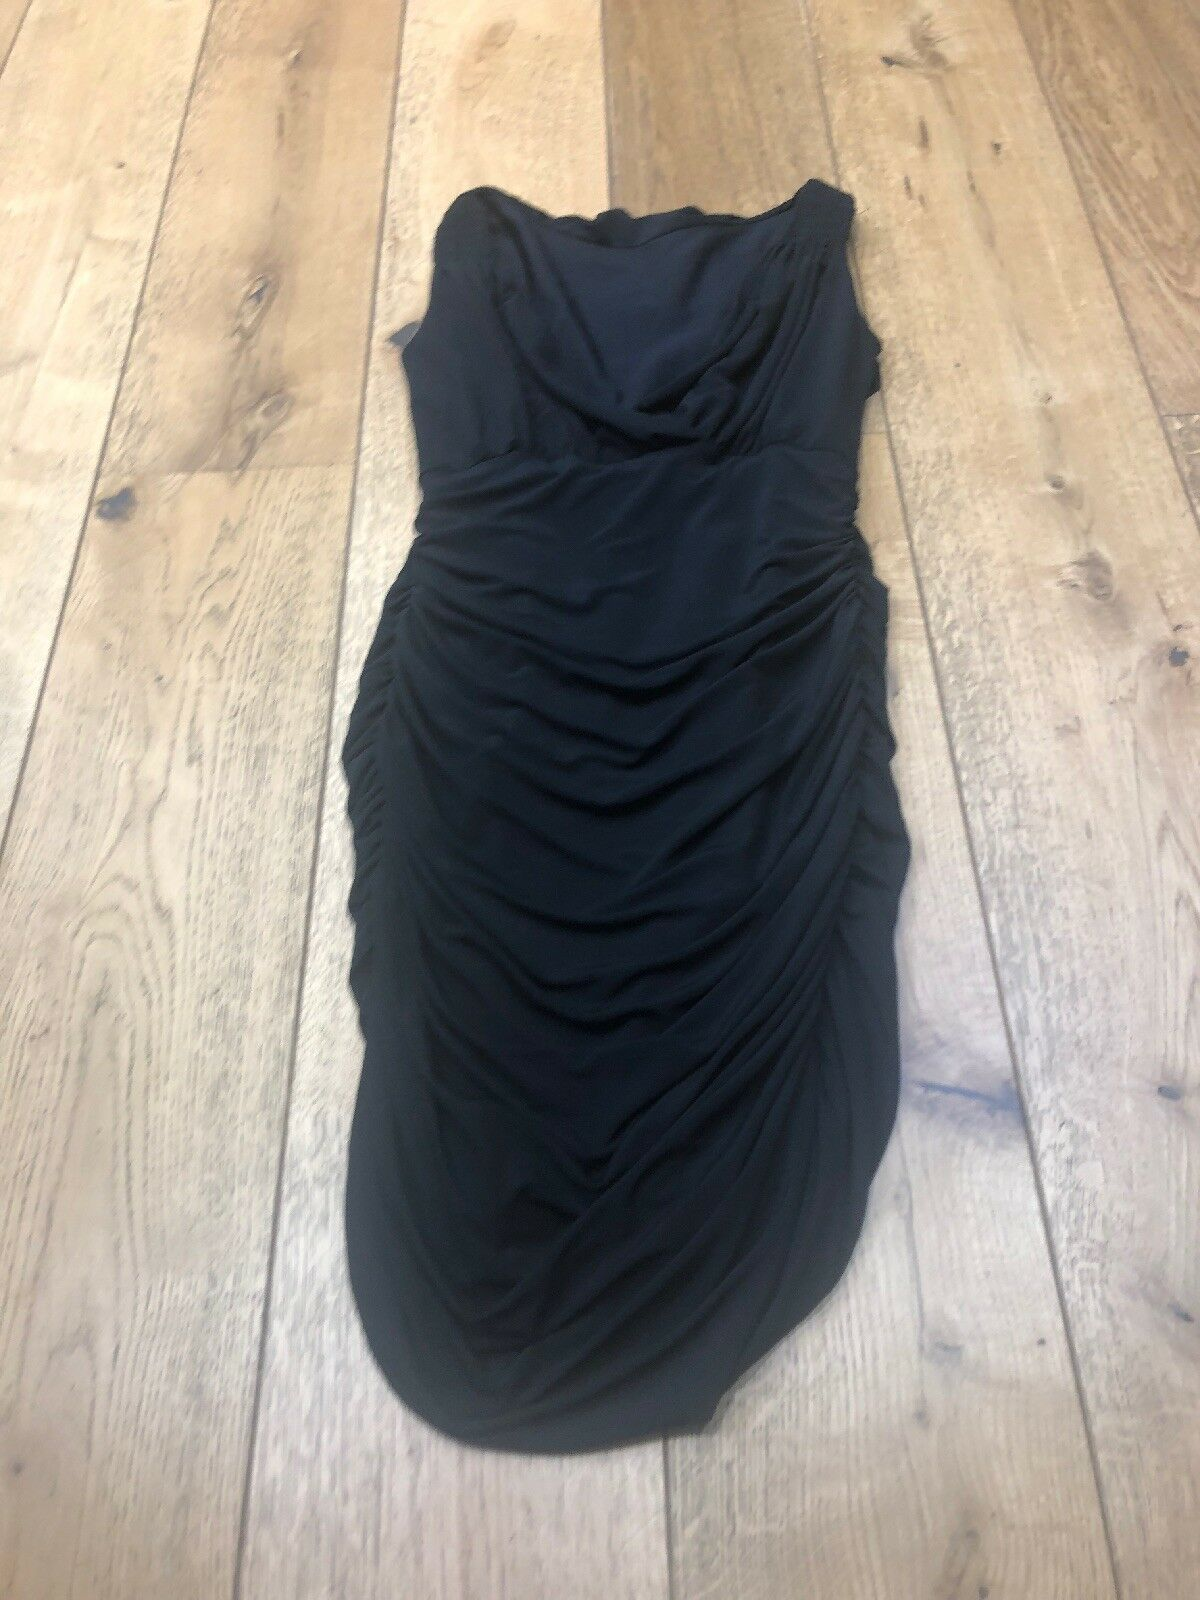 Multiway OMO Norma Kamali robe noir taille M moulante Parti stretch Wiggle AK